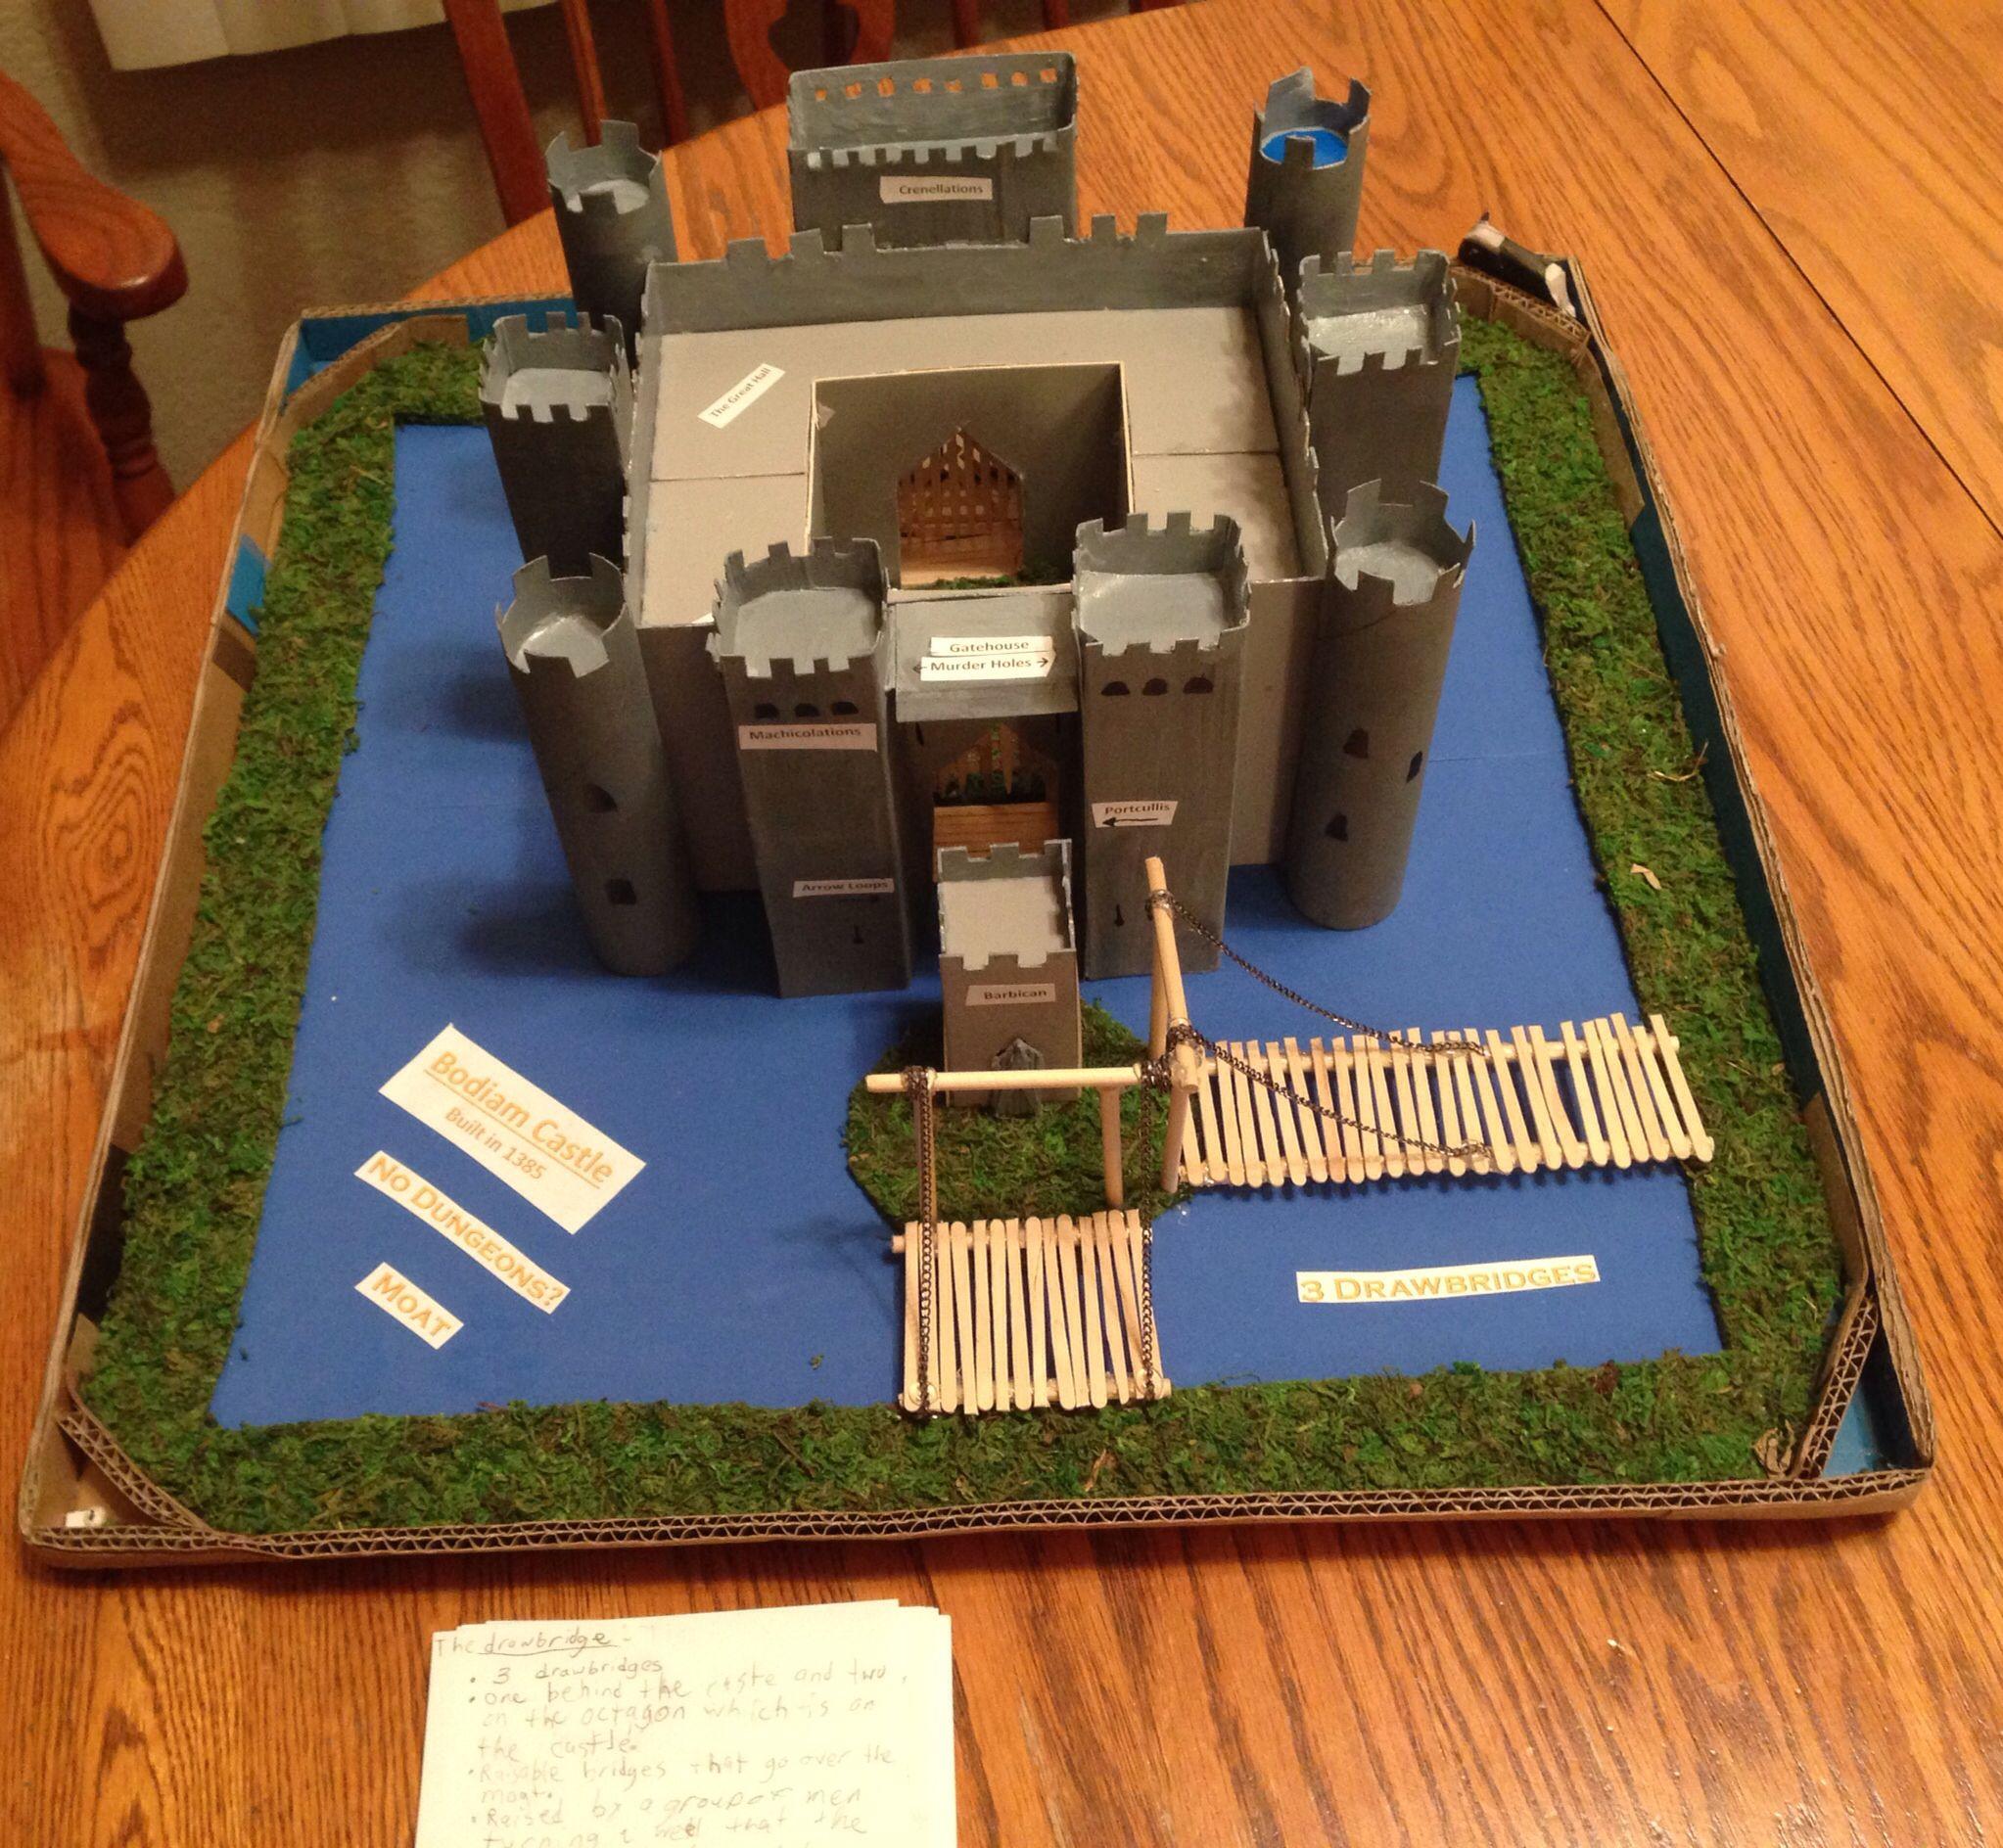 6th grade social studies - Bodiam Castle, built in 1385. Not to scale ...